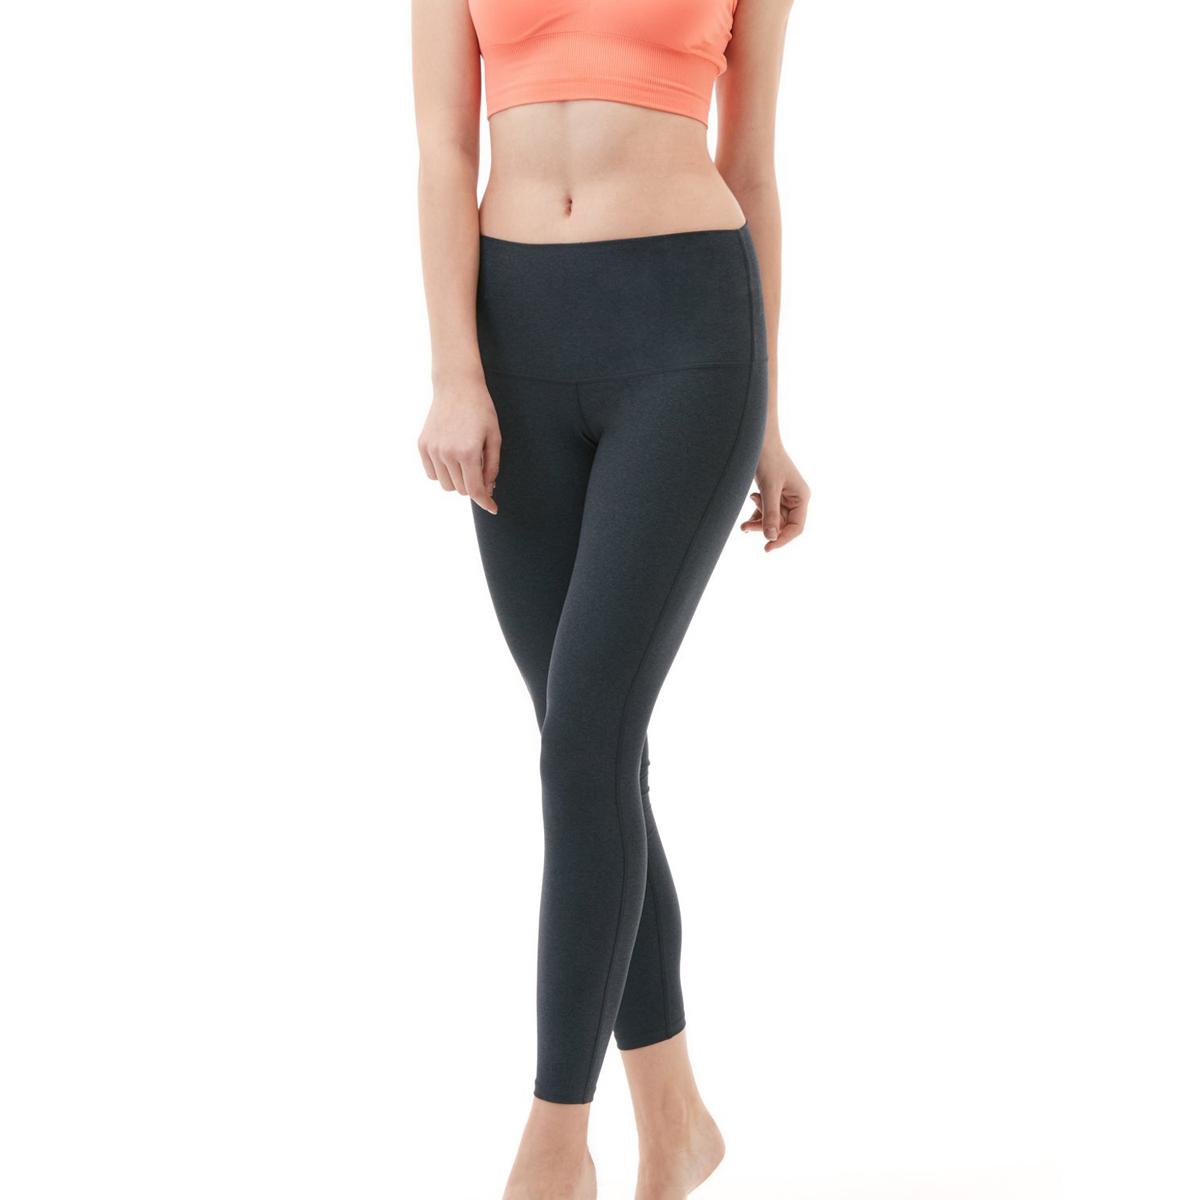 thumbnail 15 - TSLA Tesla FYP42 Women's High-Waisted Ultra-Stretch Tummy Control Yoga Pants